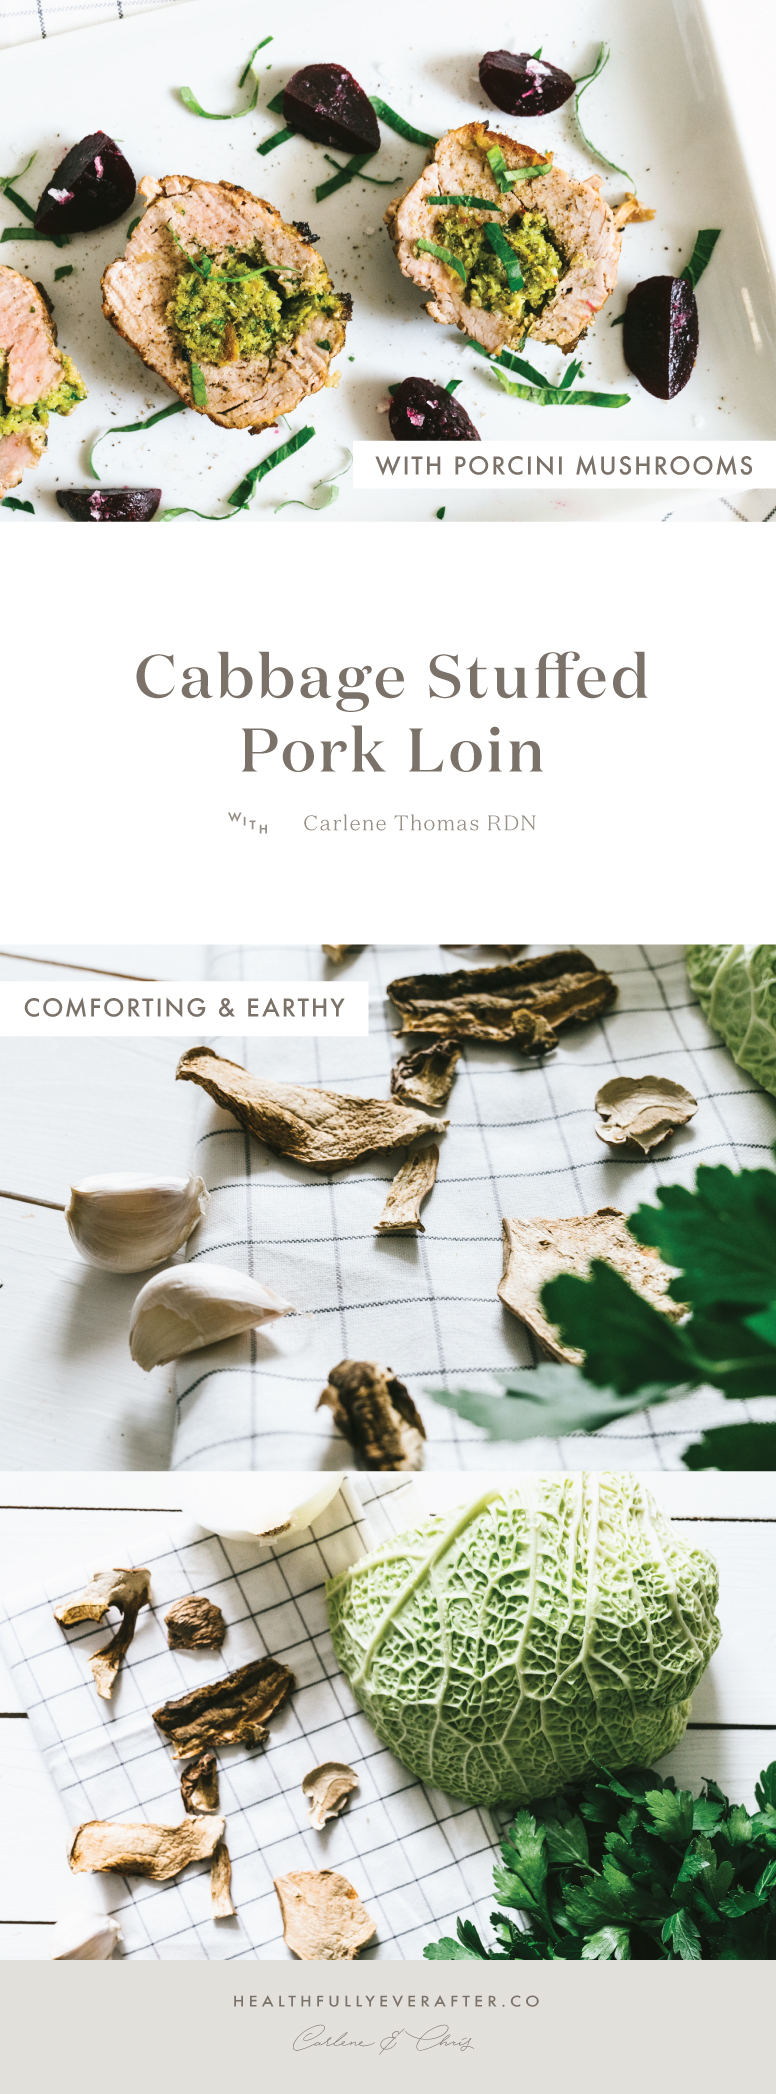 cabbage stuffed pork loin